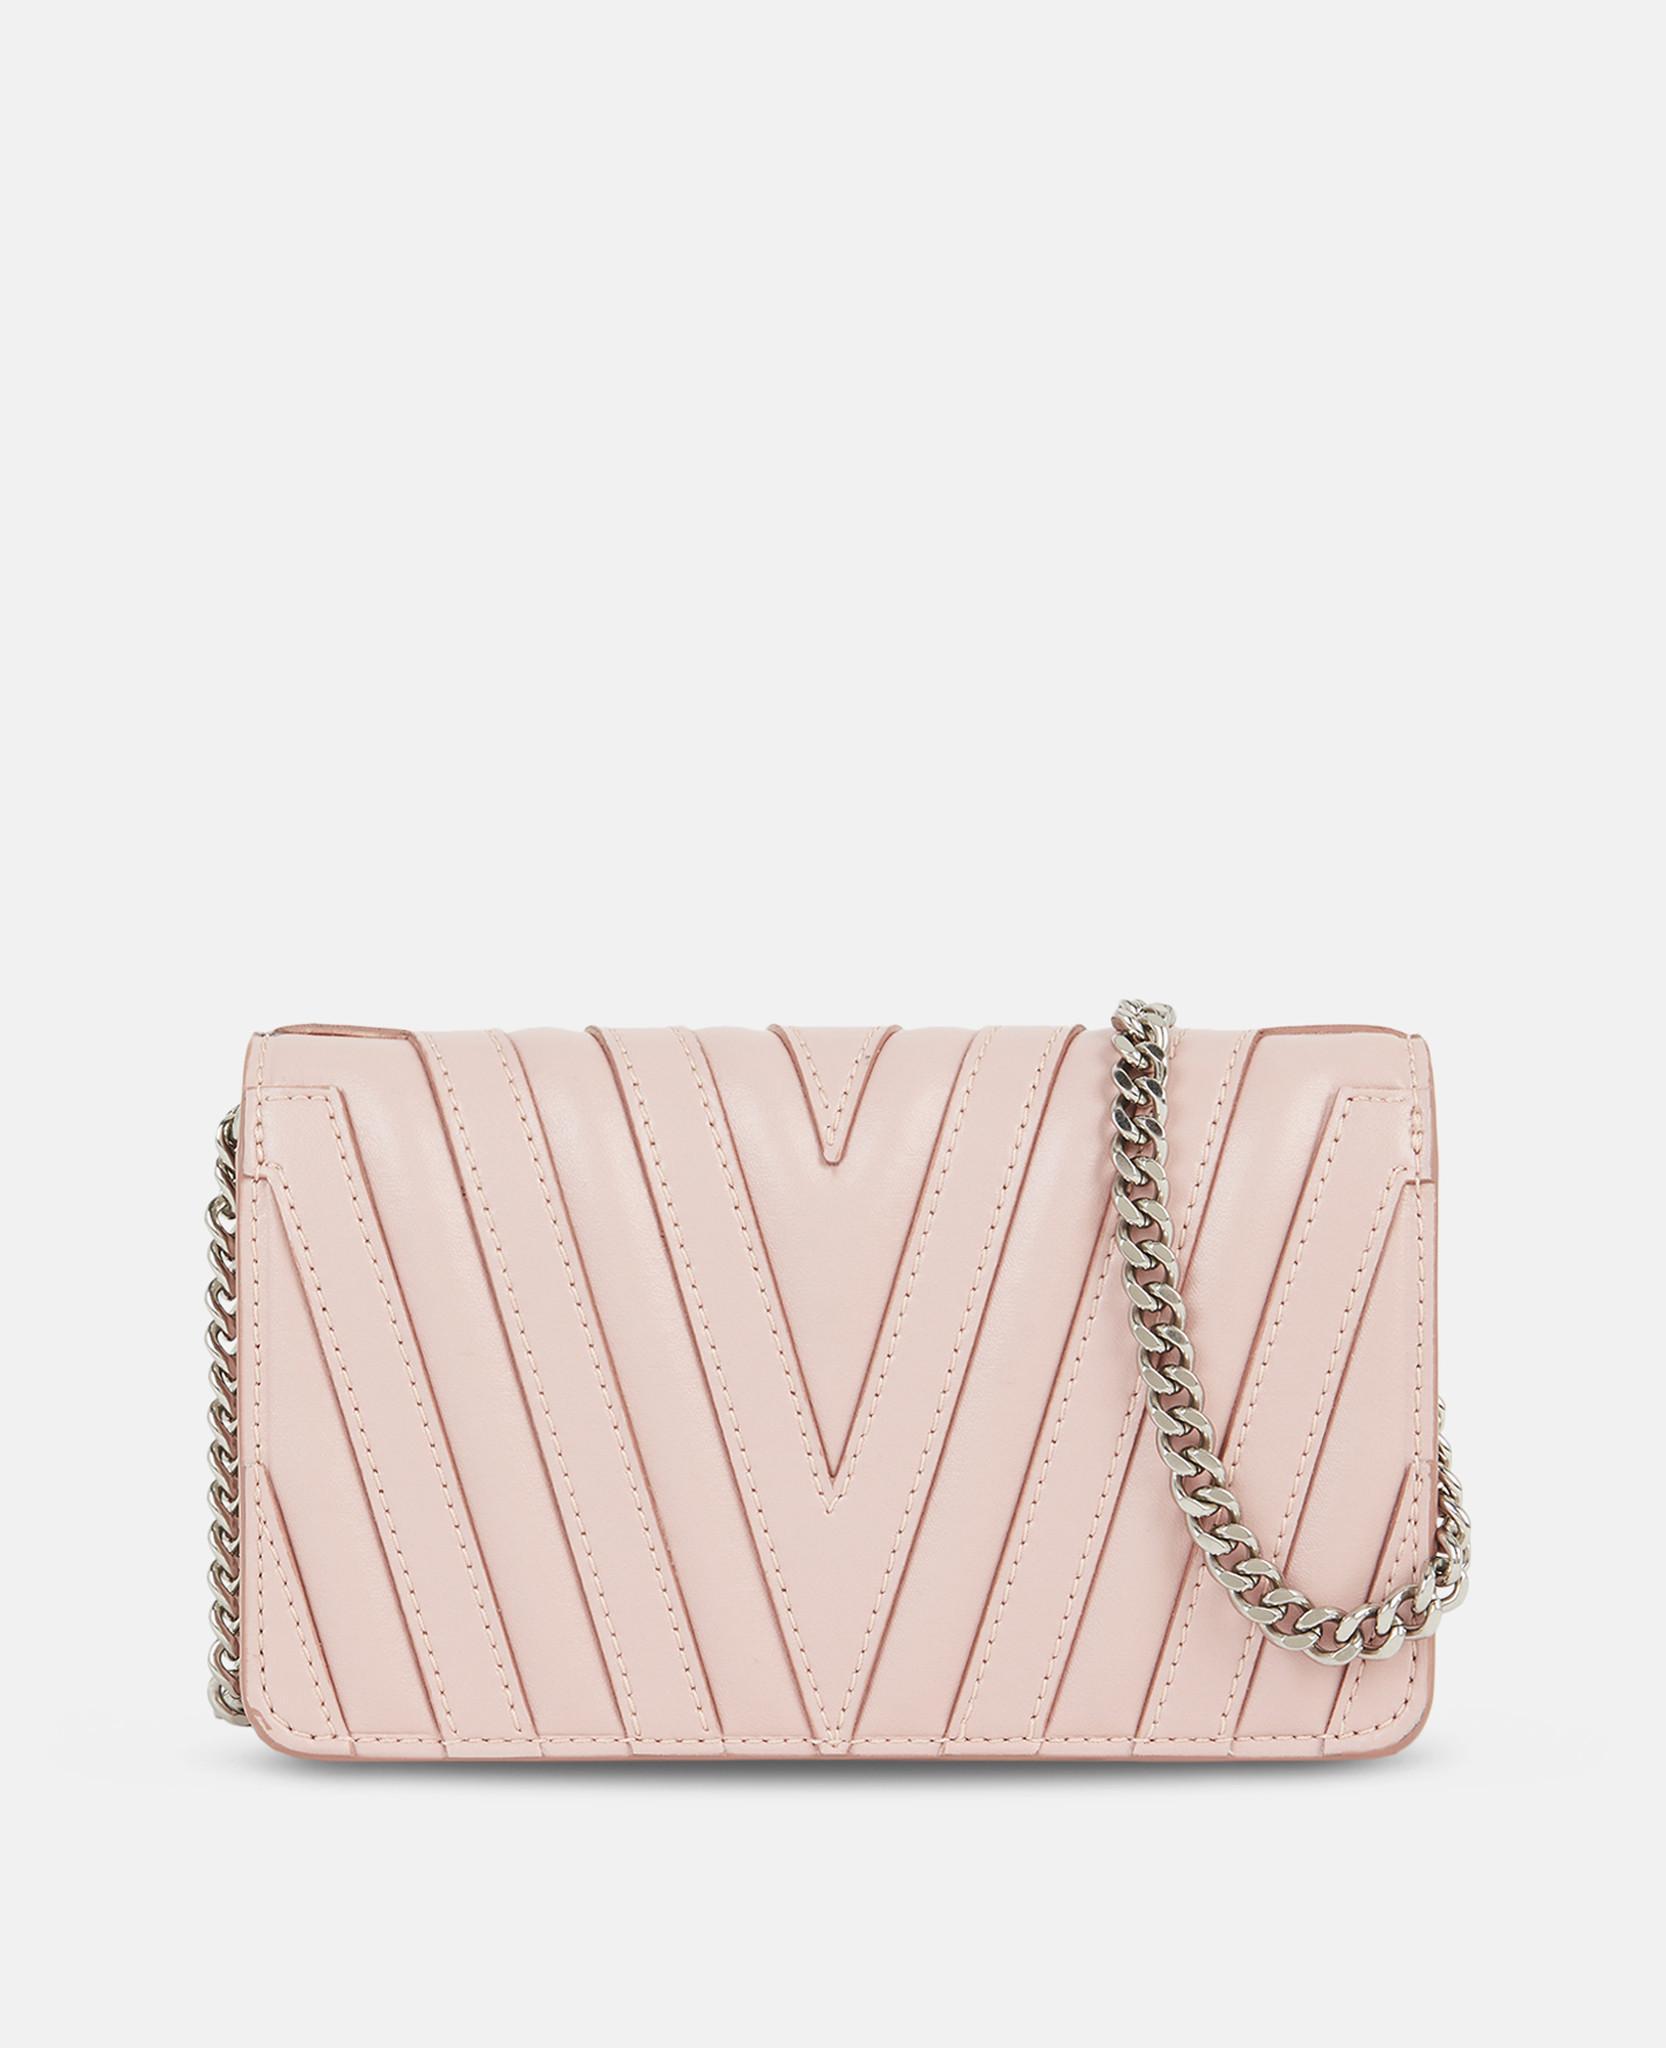 Stella McCartney Stella Star Small Flap-over Shoulder Bag in Pink - Lyst b78f9af00d8f9